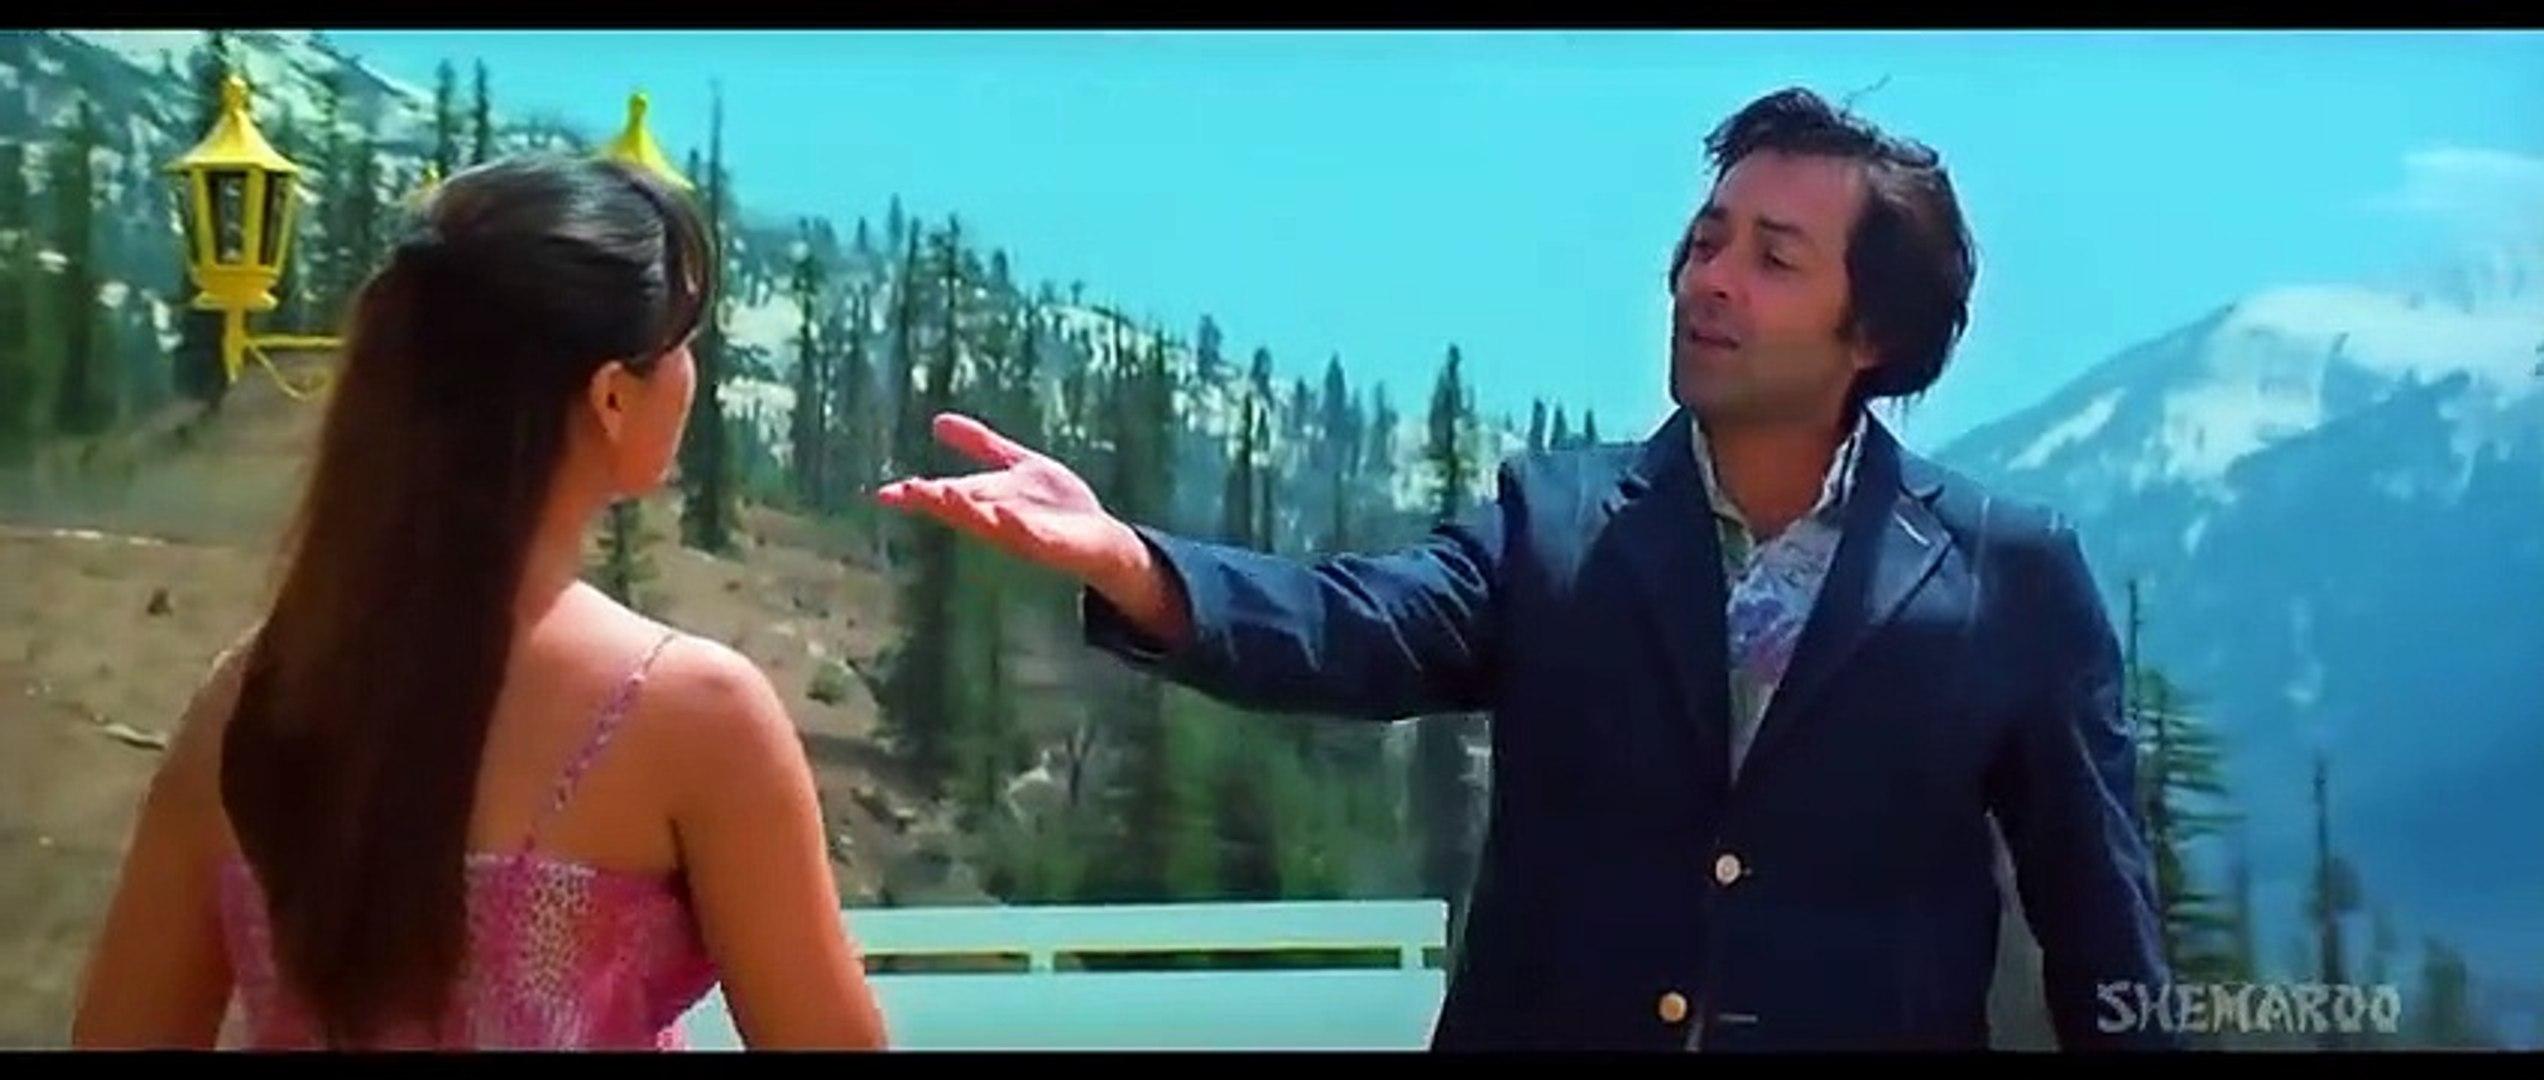 Aur Tum Aaye - Dosti-Friends Forever Songs - Bobby Deol - Lara Dutta - Alka Yagnik - Romantic Song